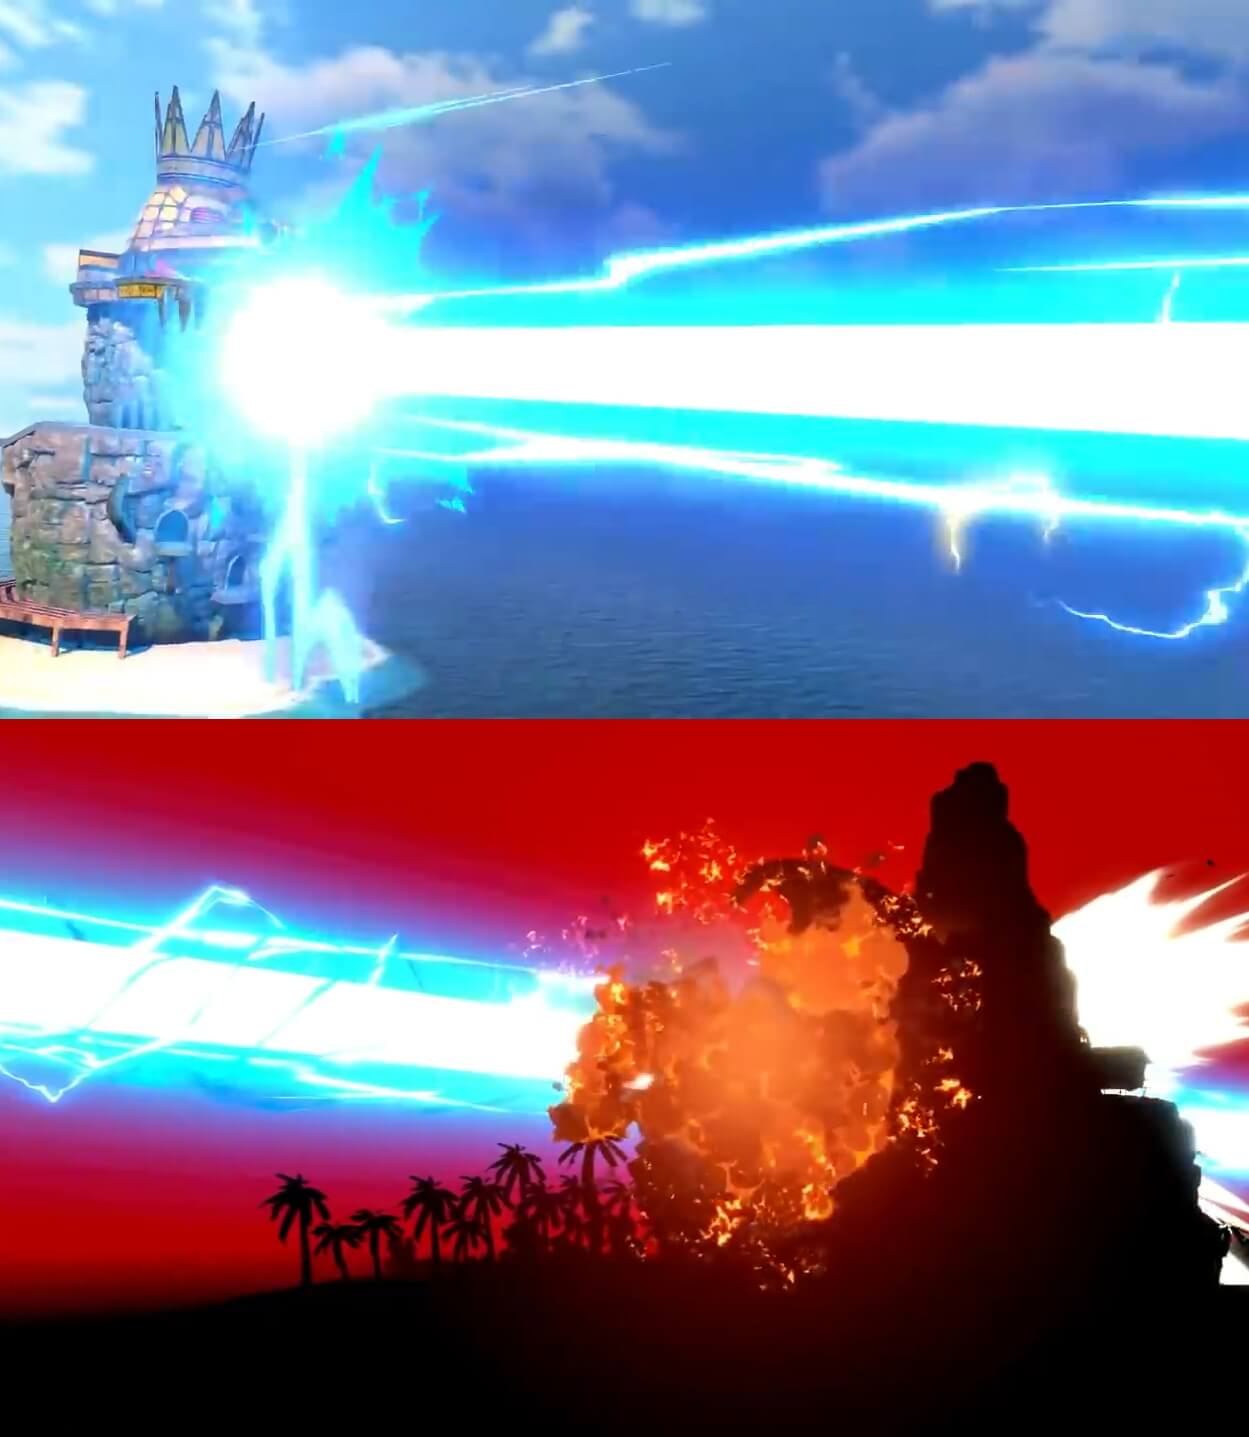 Plantilla de King K.Rool Destruyendo la Isla DK